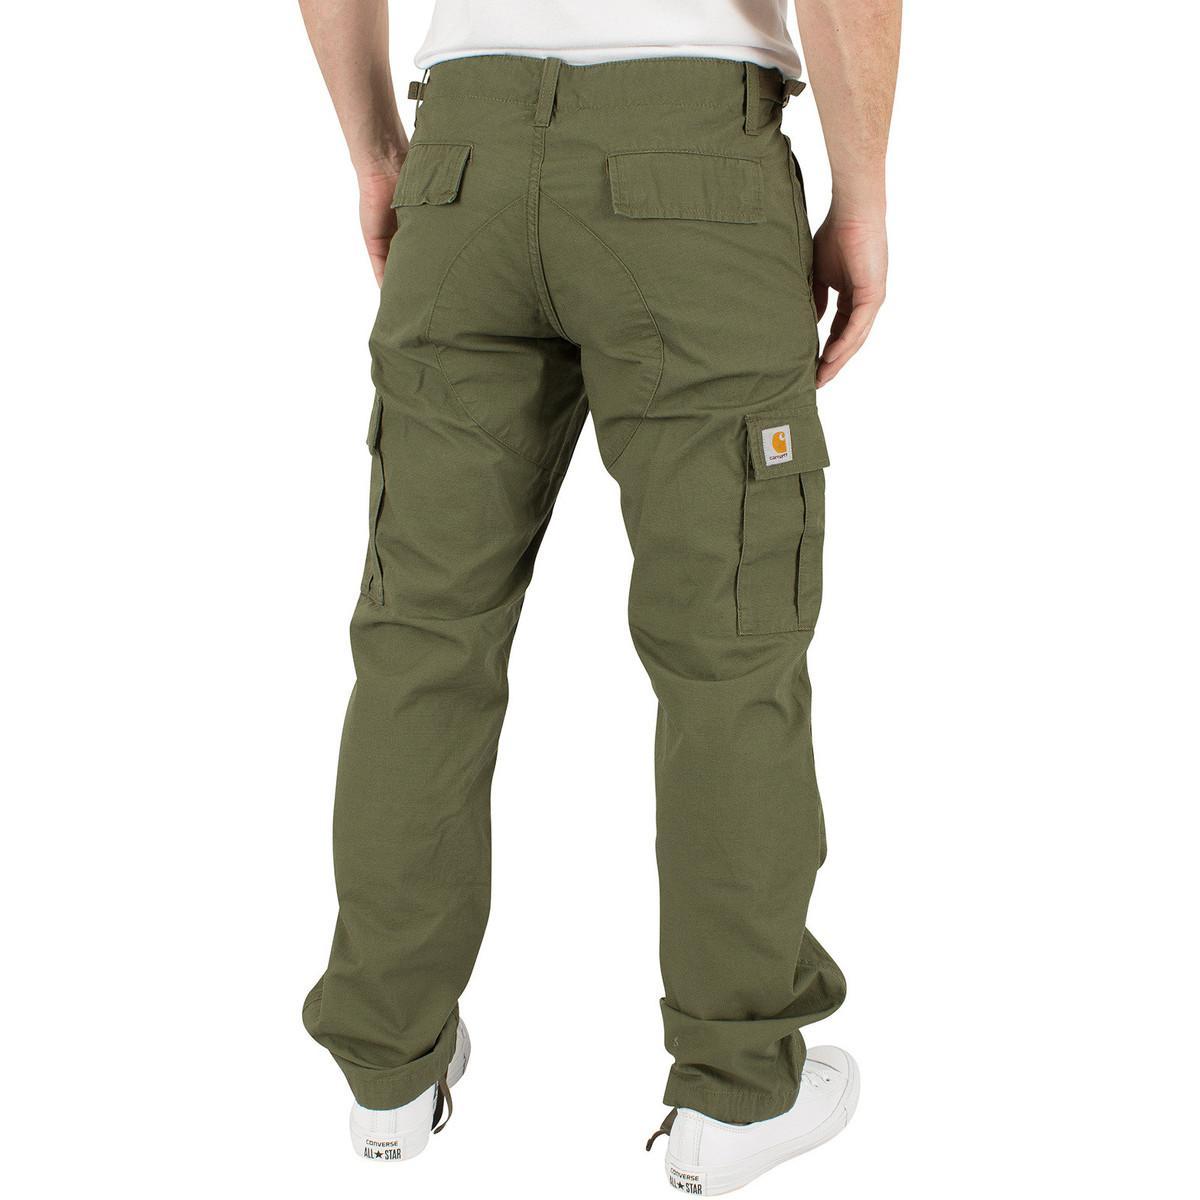 Carhartt WIP Men's Aviation Slim Fit Cargos, Green Men's Trousers In Green for Men